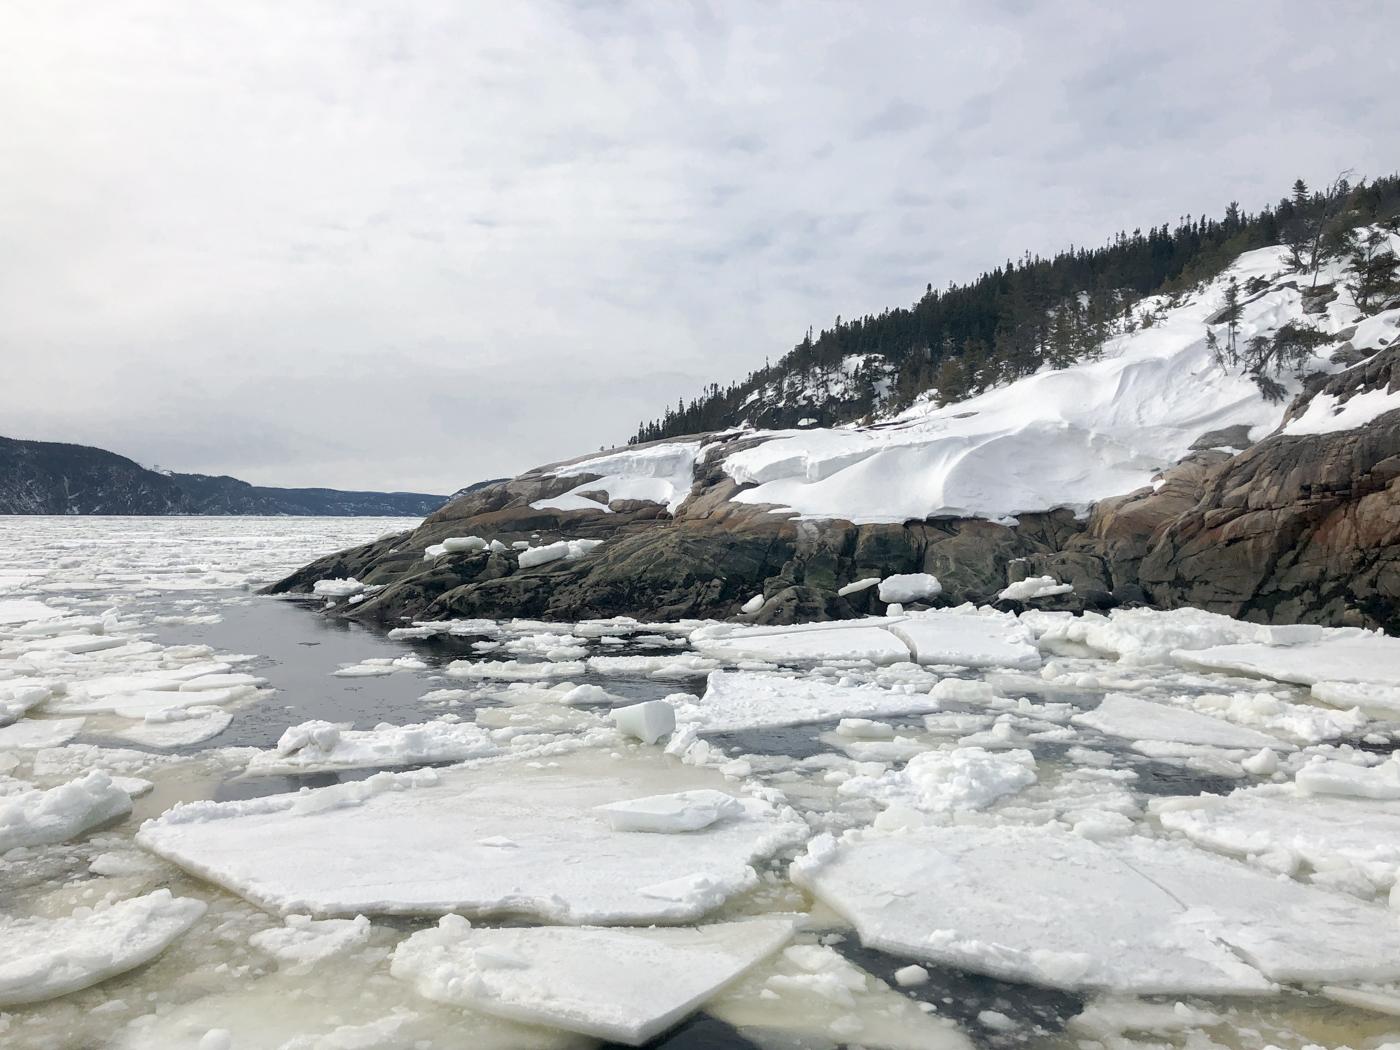 Baie de Tadoussac au Québec